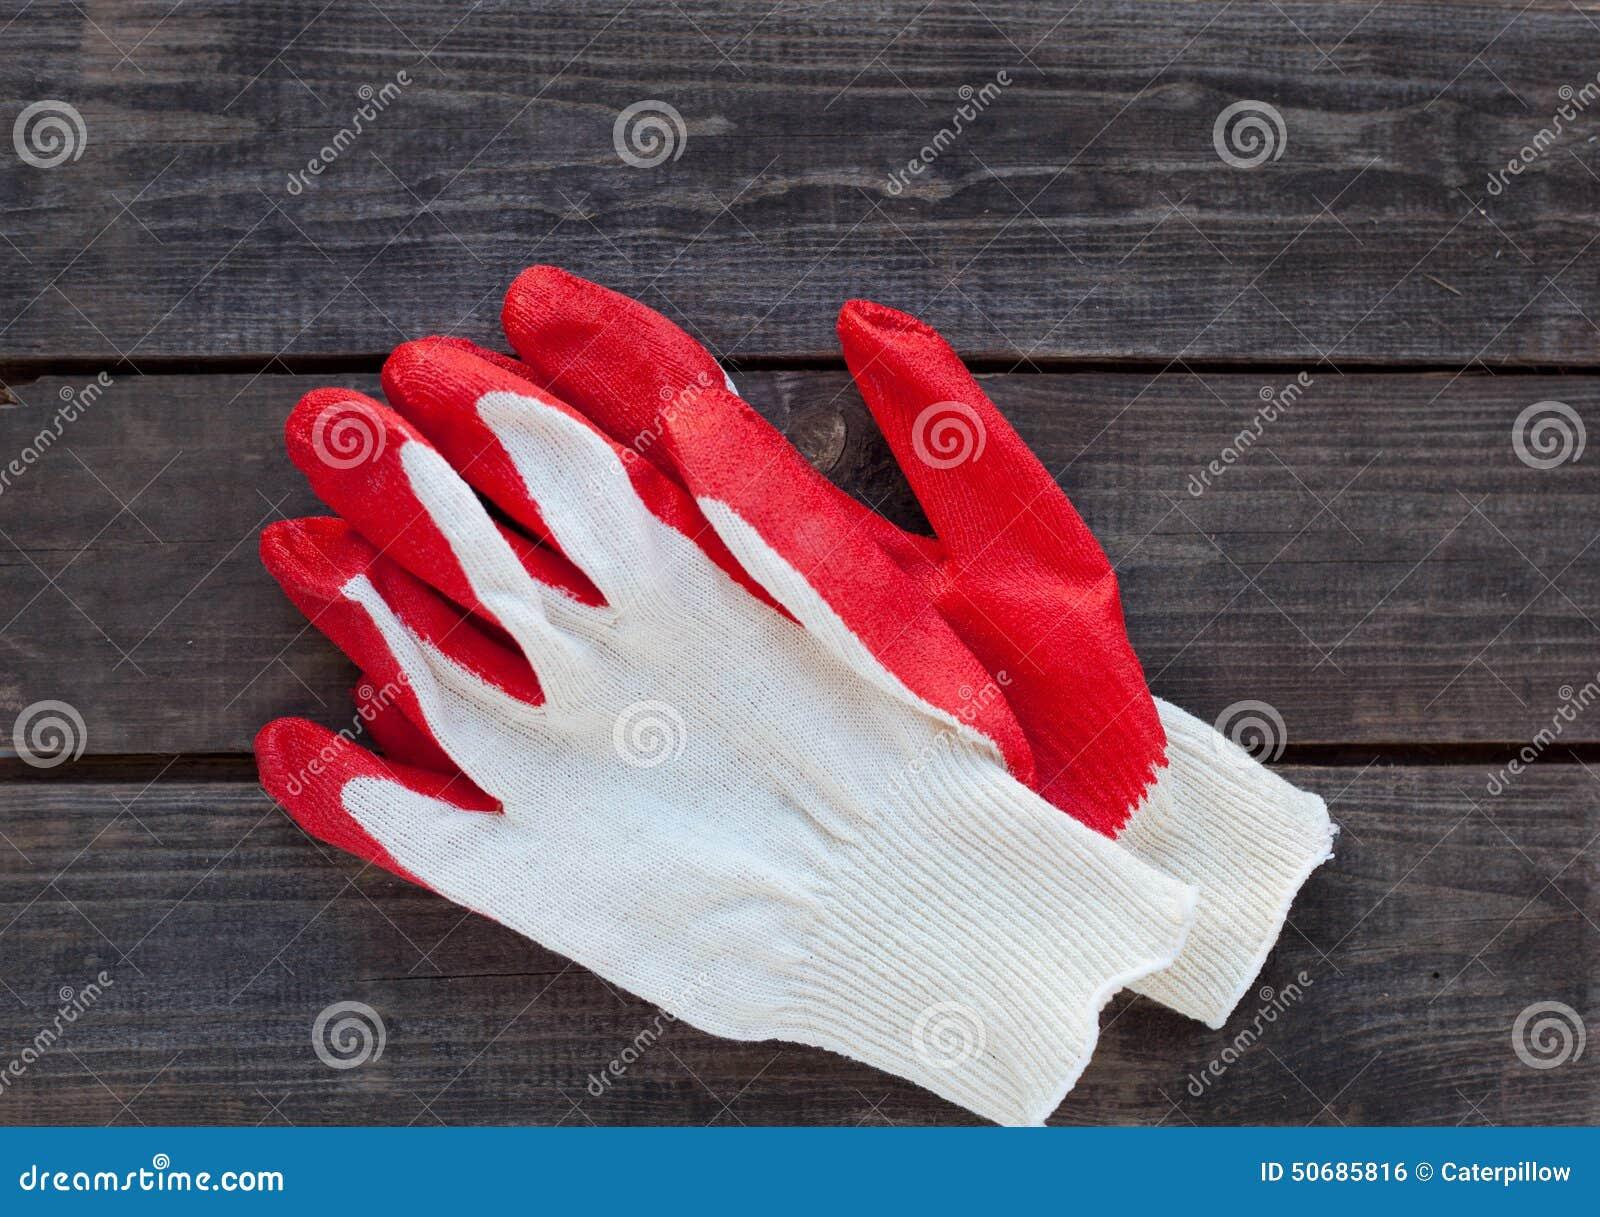 Download 运作的手套准备好在土气木头 库存照片. 图片 包括有 职业, 庭院, 背包, 详细资料, 红色, 皮肤, 材料 - 50685816